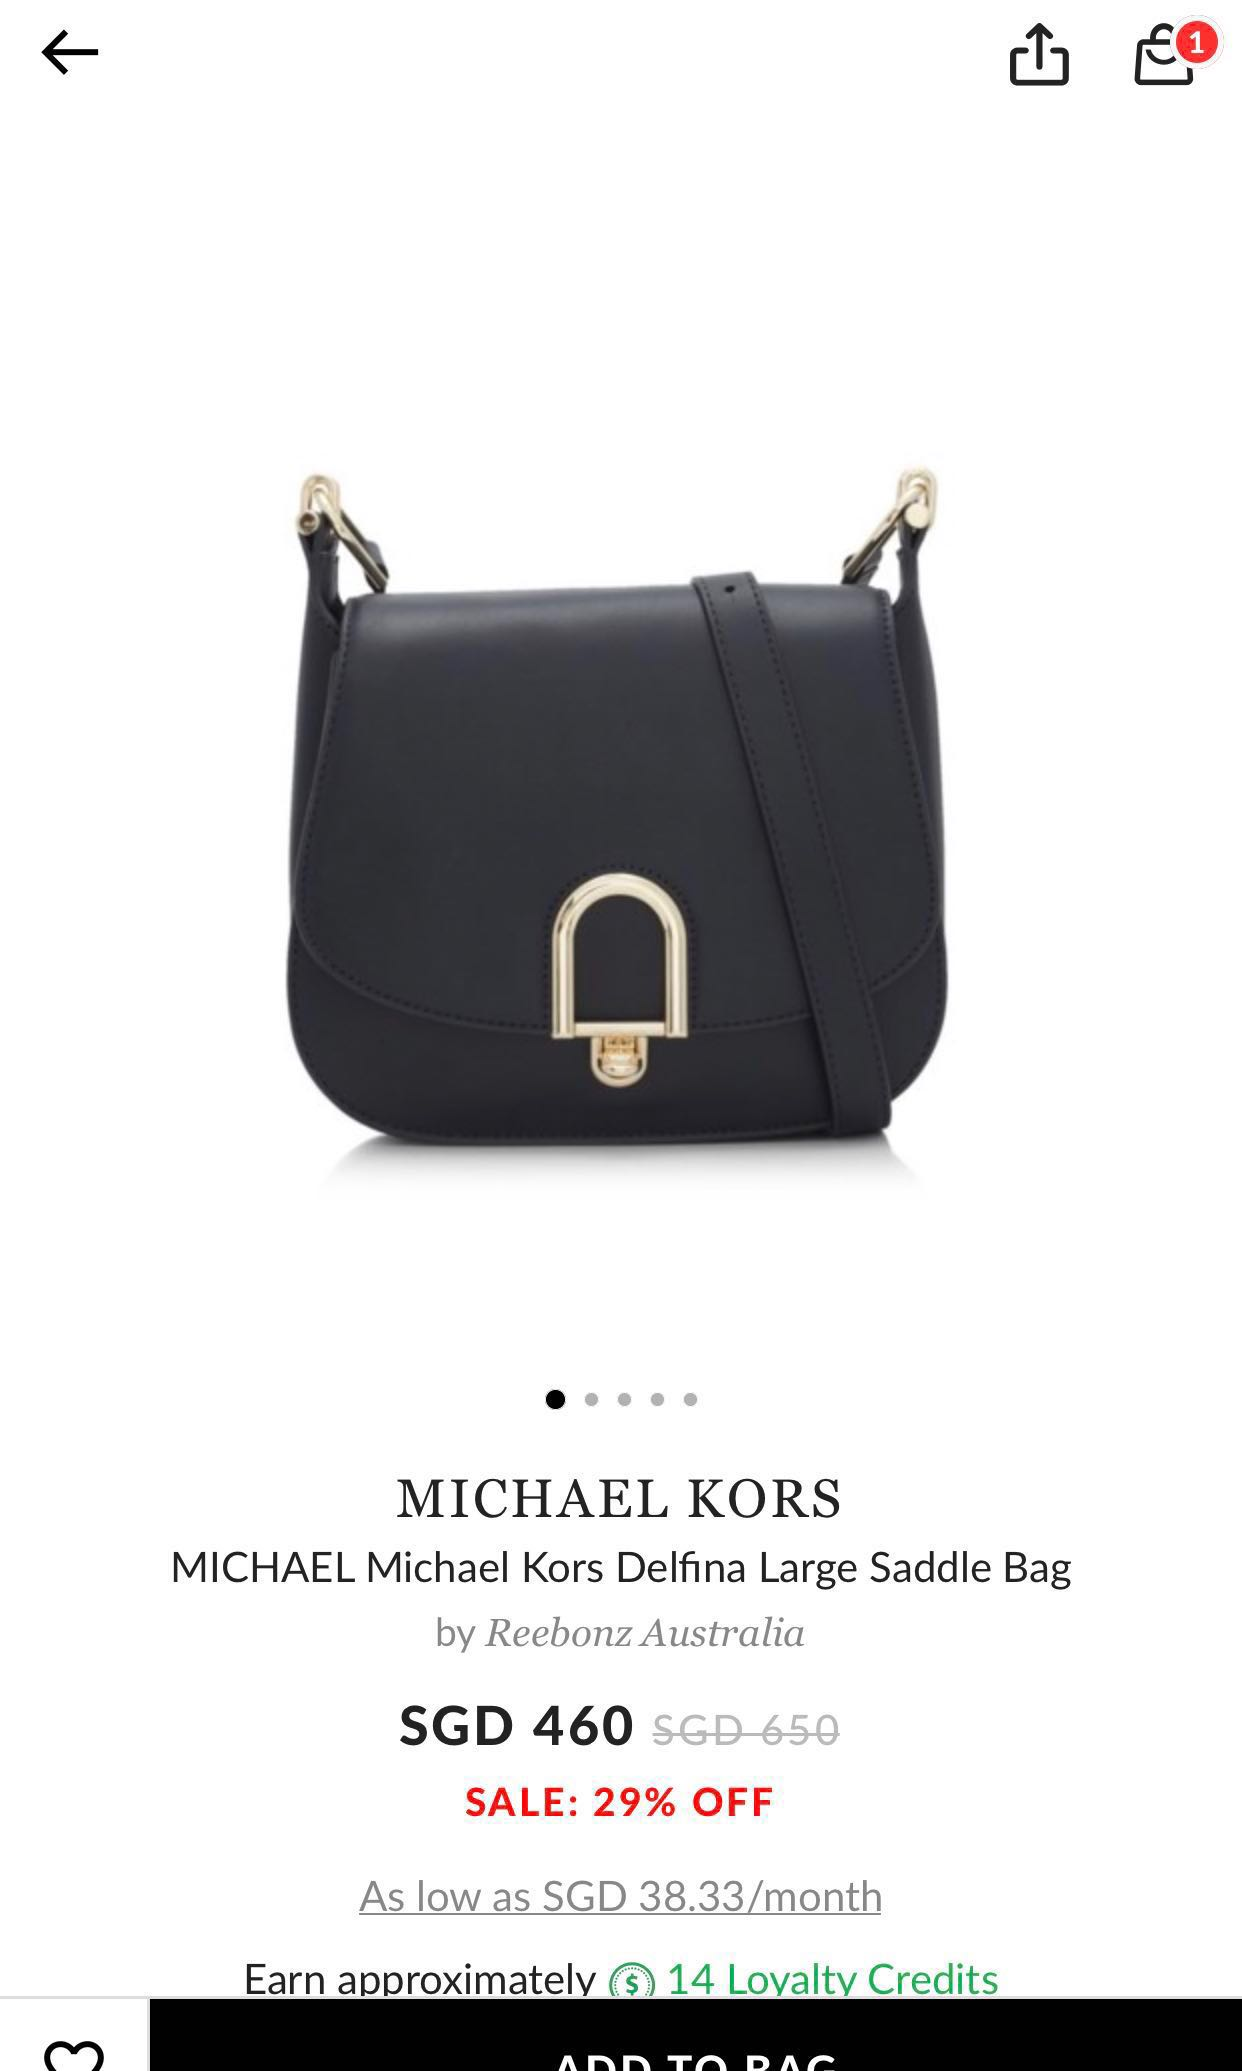 98b9e699cdac AUTHENTIC Brand new Michael Kors Delfina Large Saddle Bag